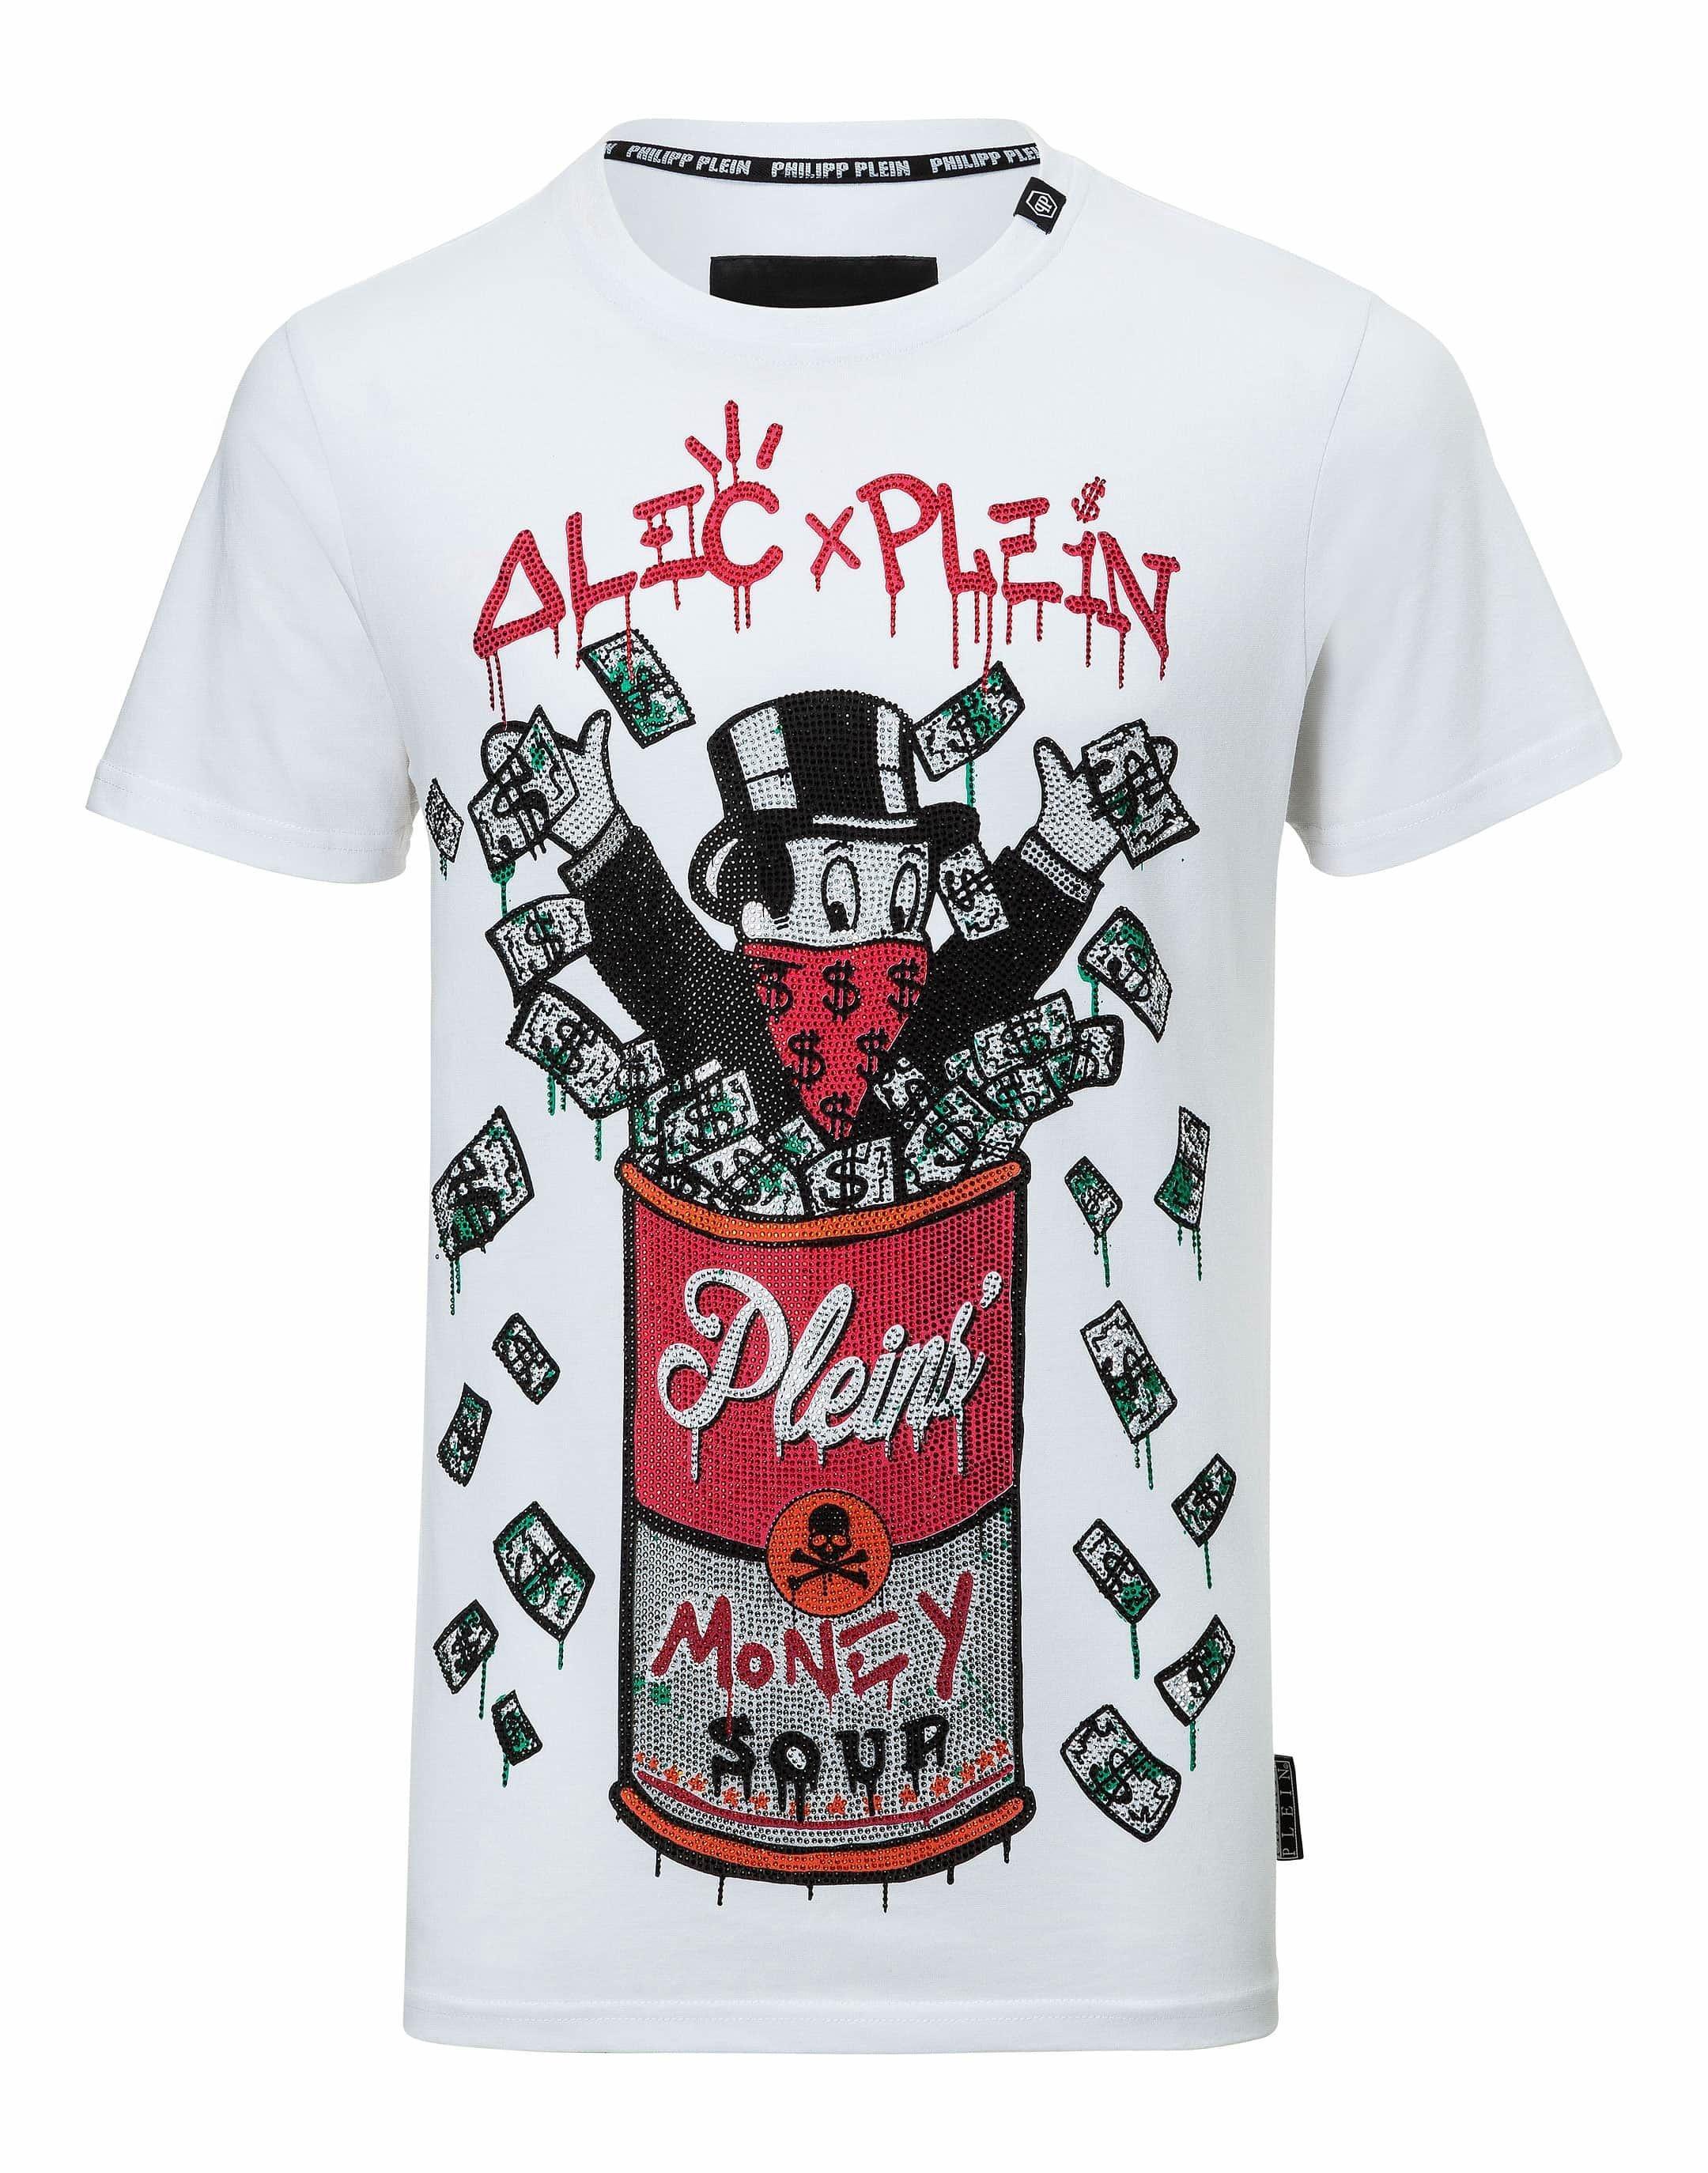 monopol t-shirt Philipp Plein Sale Footlocker Cheap Sale Cheapest Price Store Sale ZWXFf0uQ0